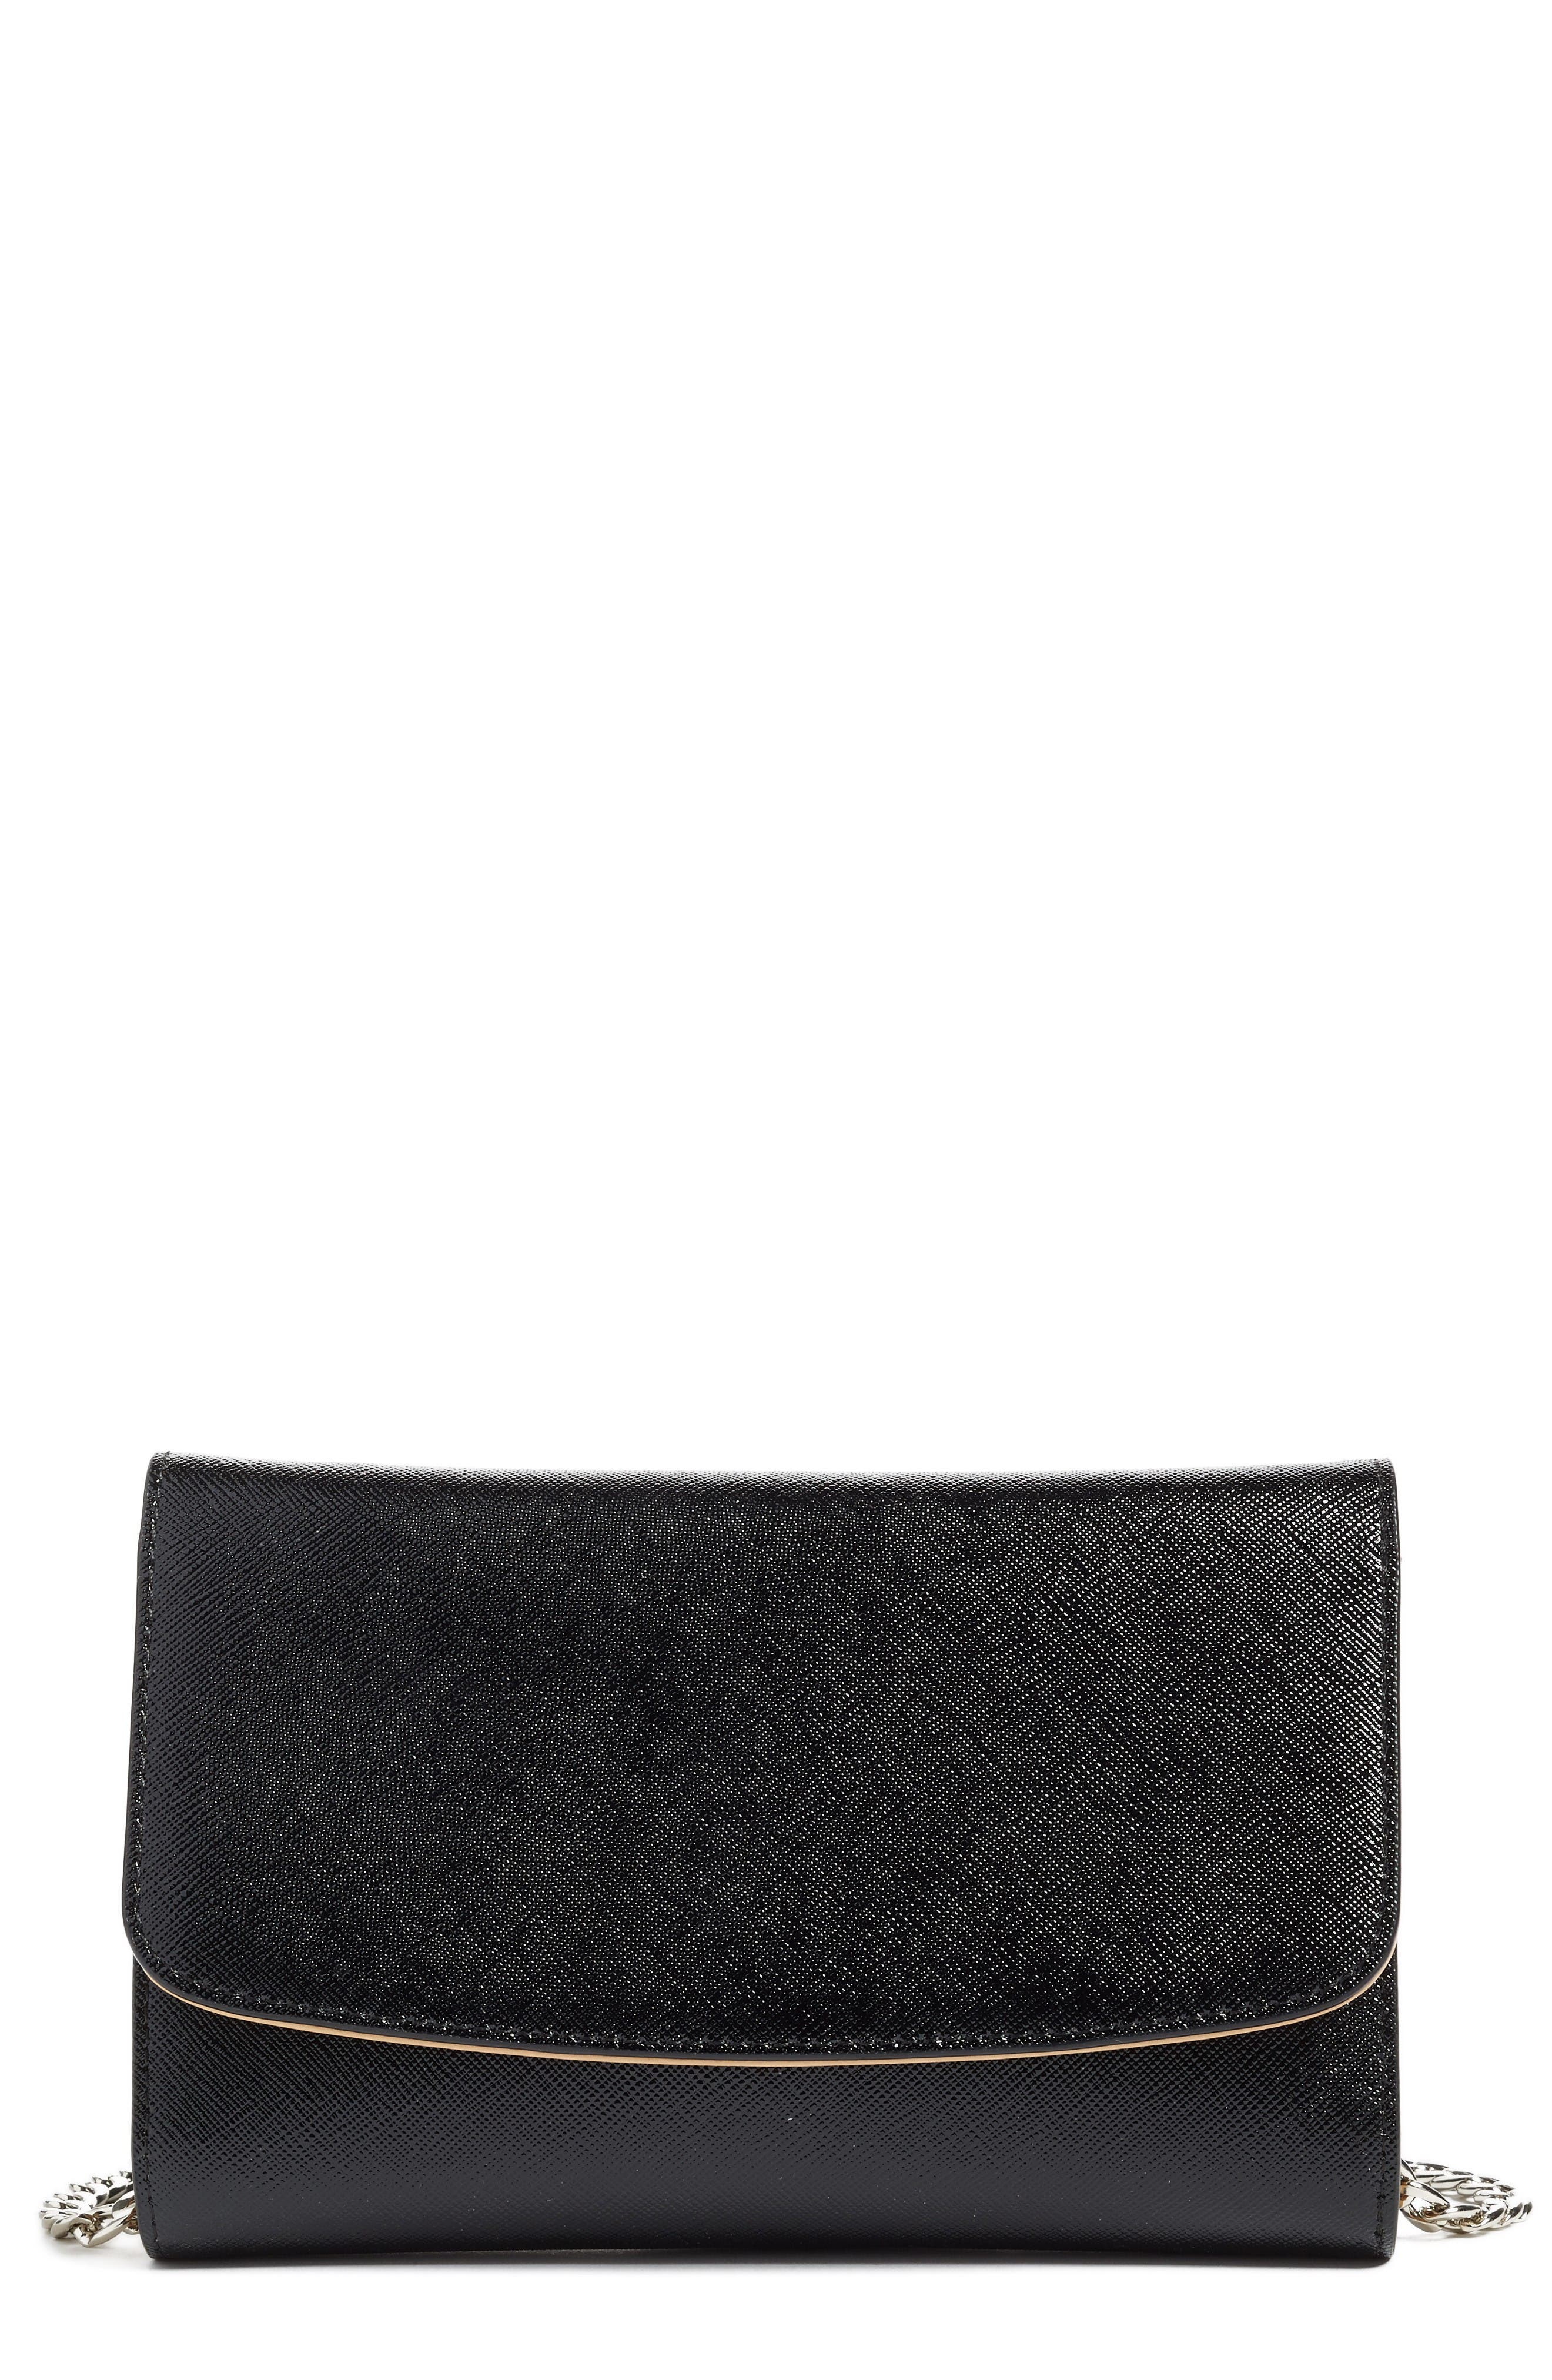 Wallet on a Chain,                             Main thumbnail 1, color,                             Black Saffiano